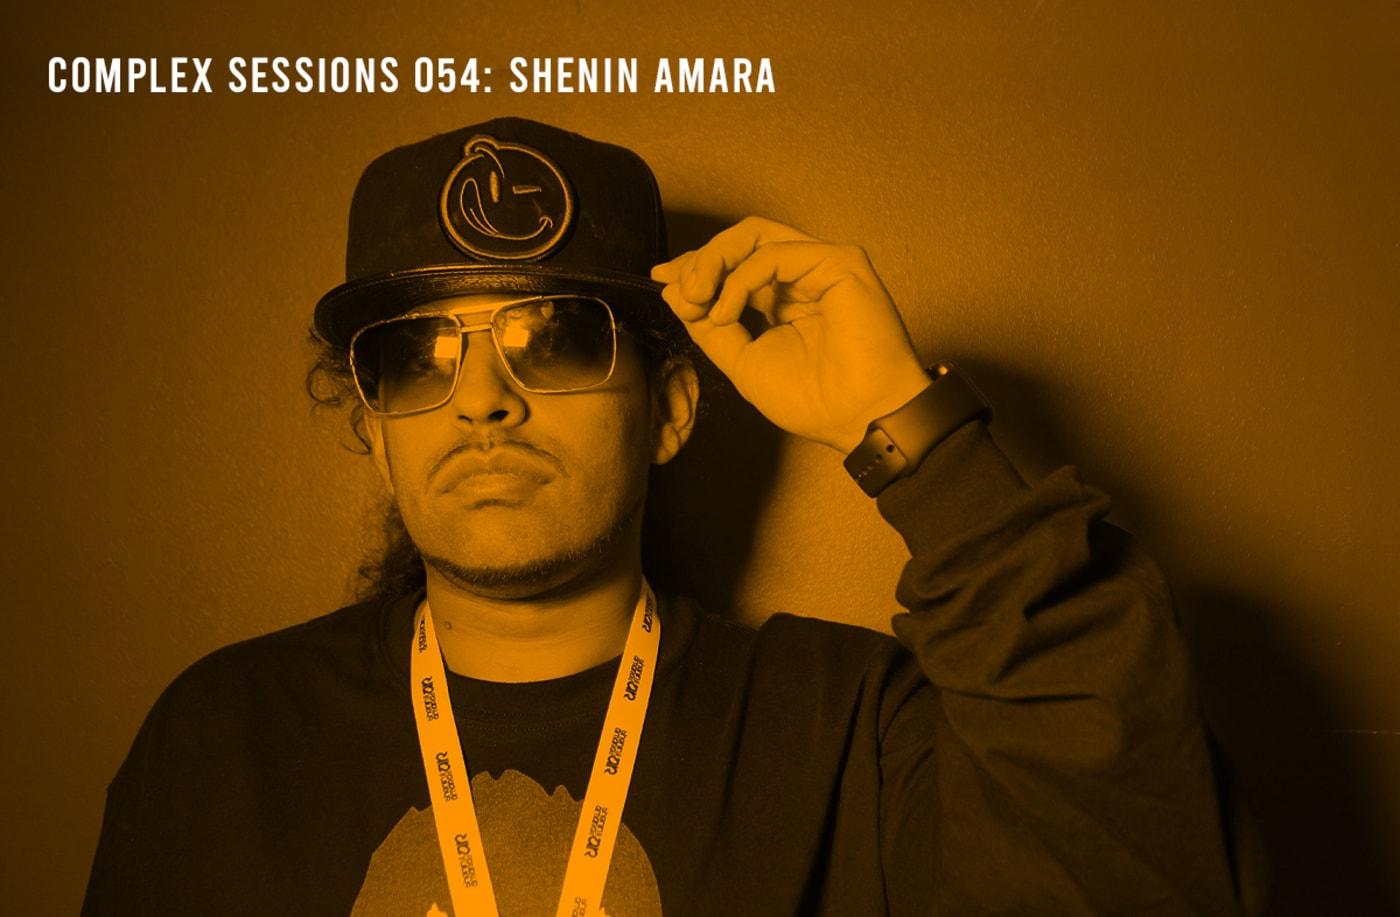 complex sessions 054 shenin amara